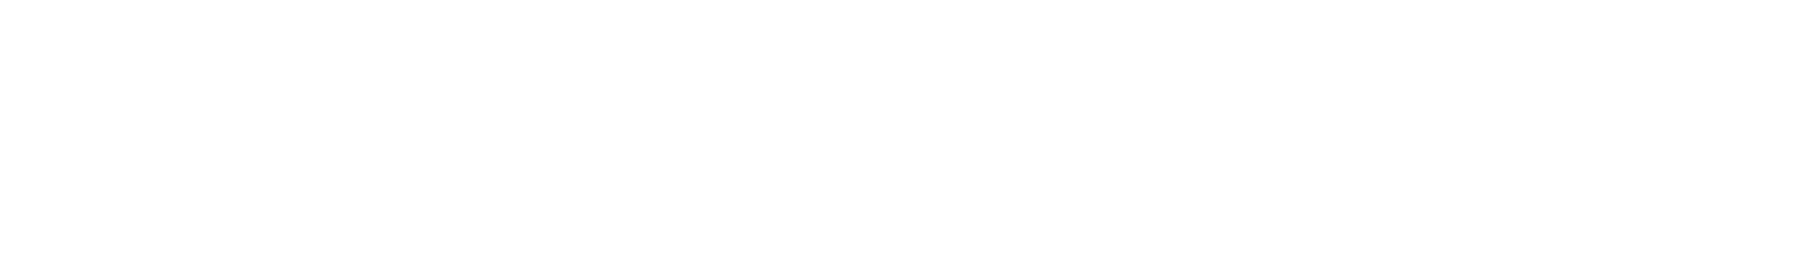 vedh synth cut 025 f